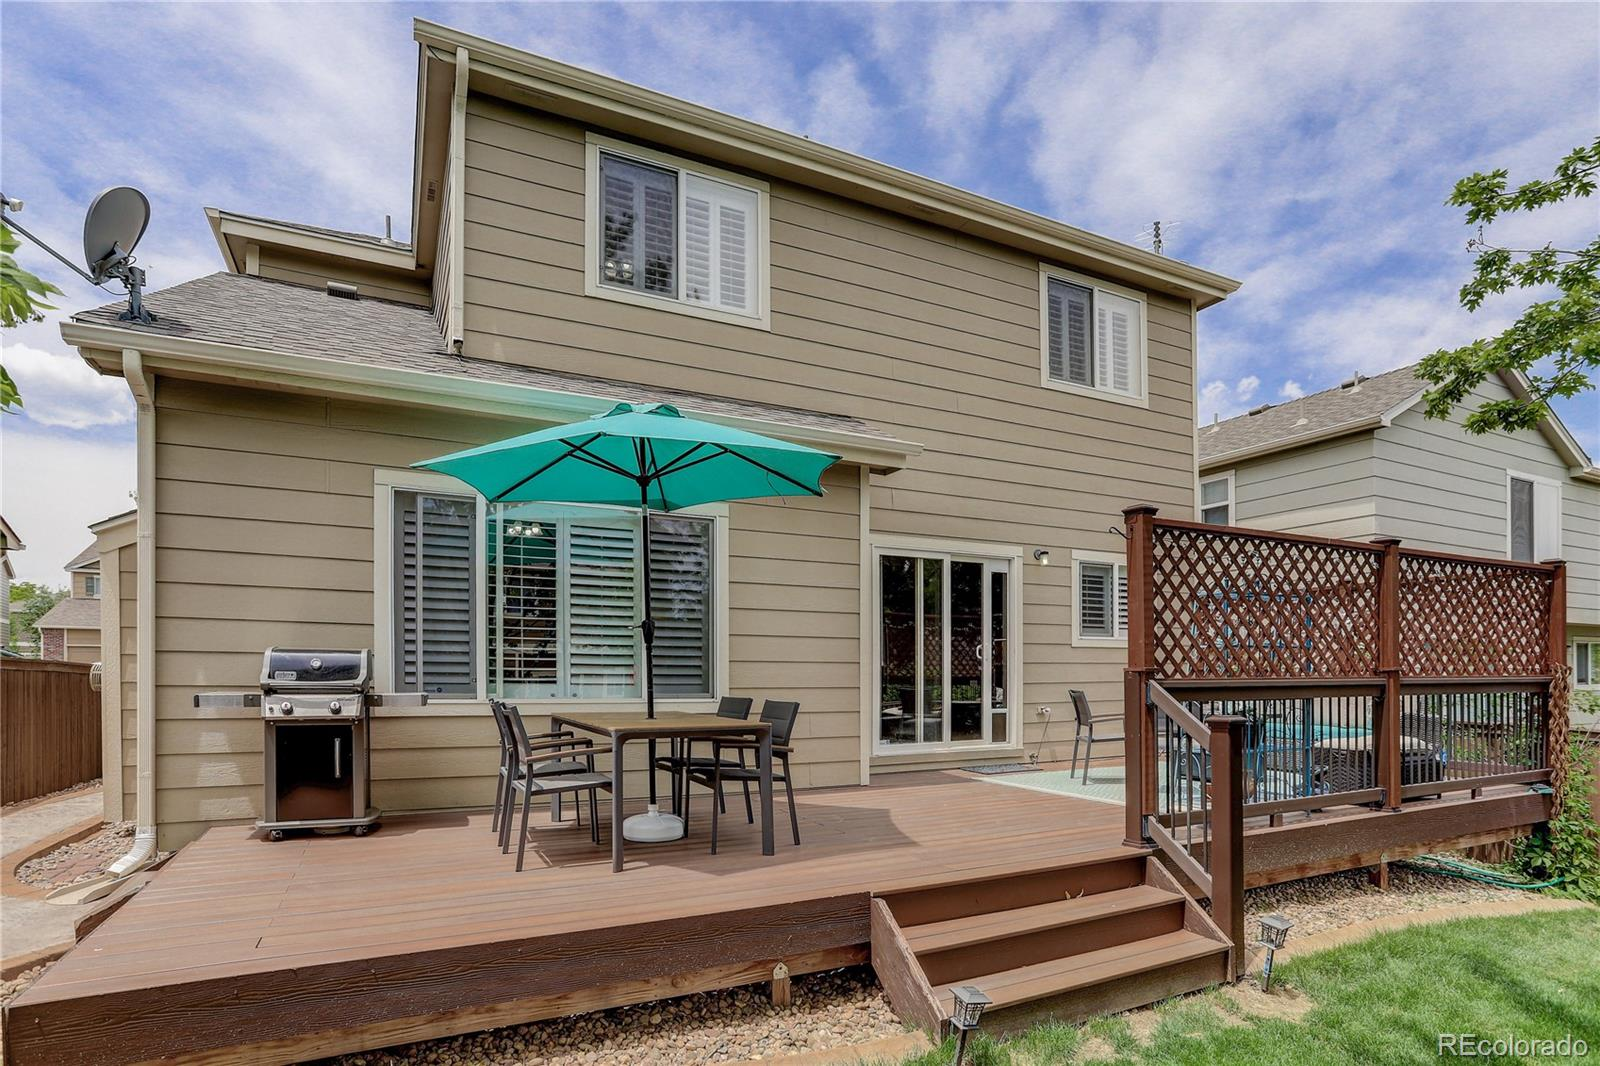 MLS# 5378399 - 40 - 10315 Rotherwood Circle, Highlands Ranch, CO 80130